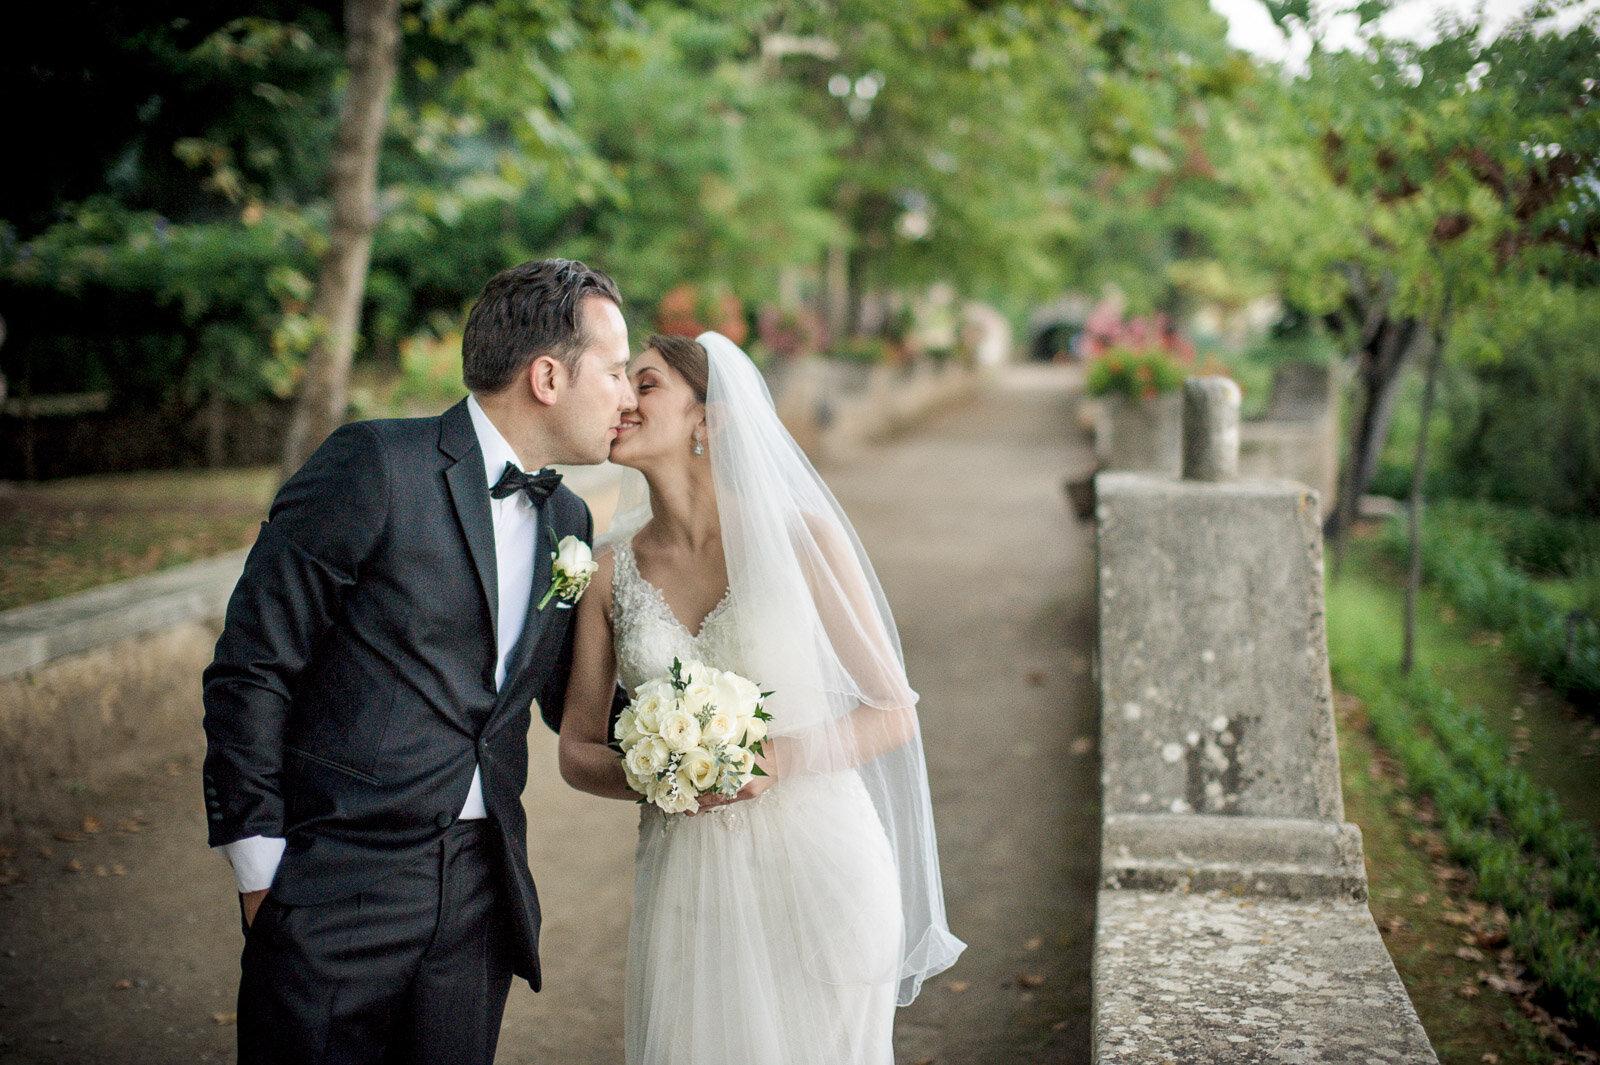 Russian Wedding in Villa Cimbrone Costiera Amalfitana 01-3.jpg